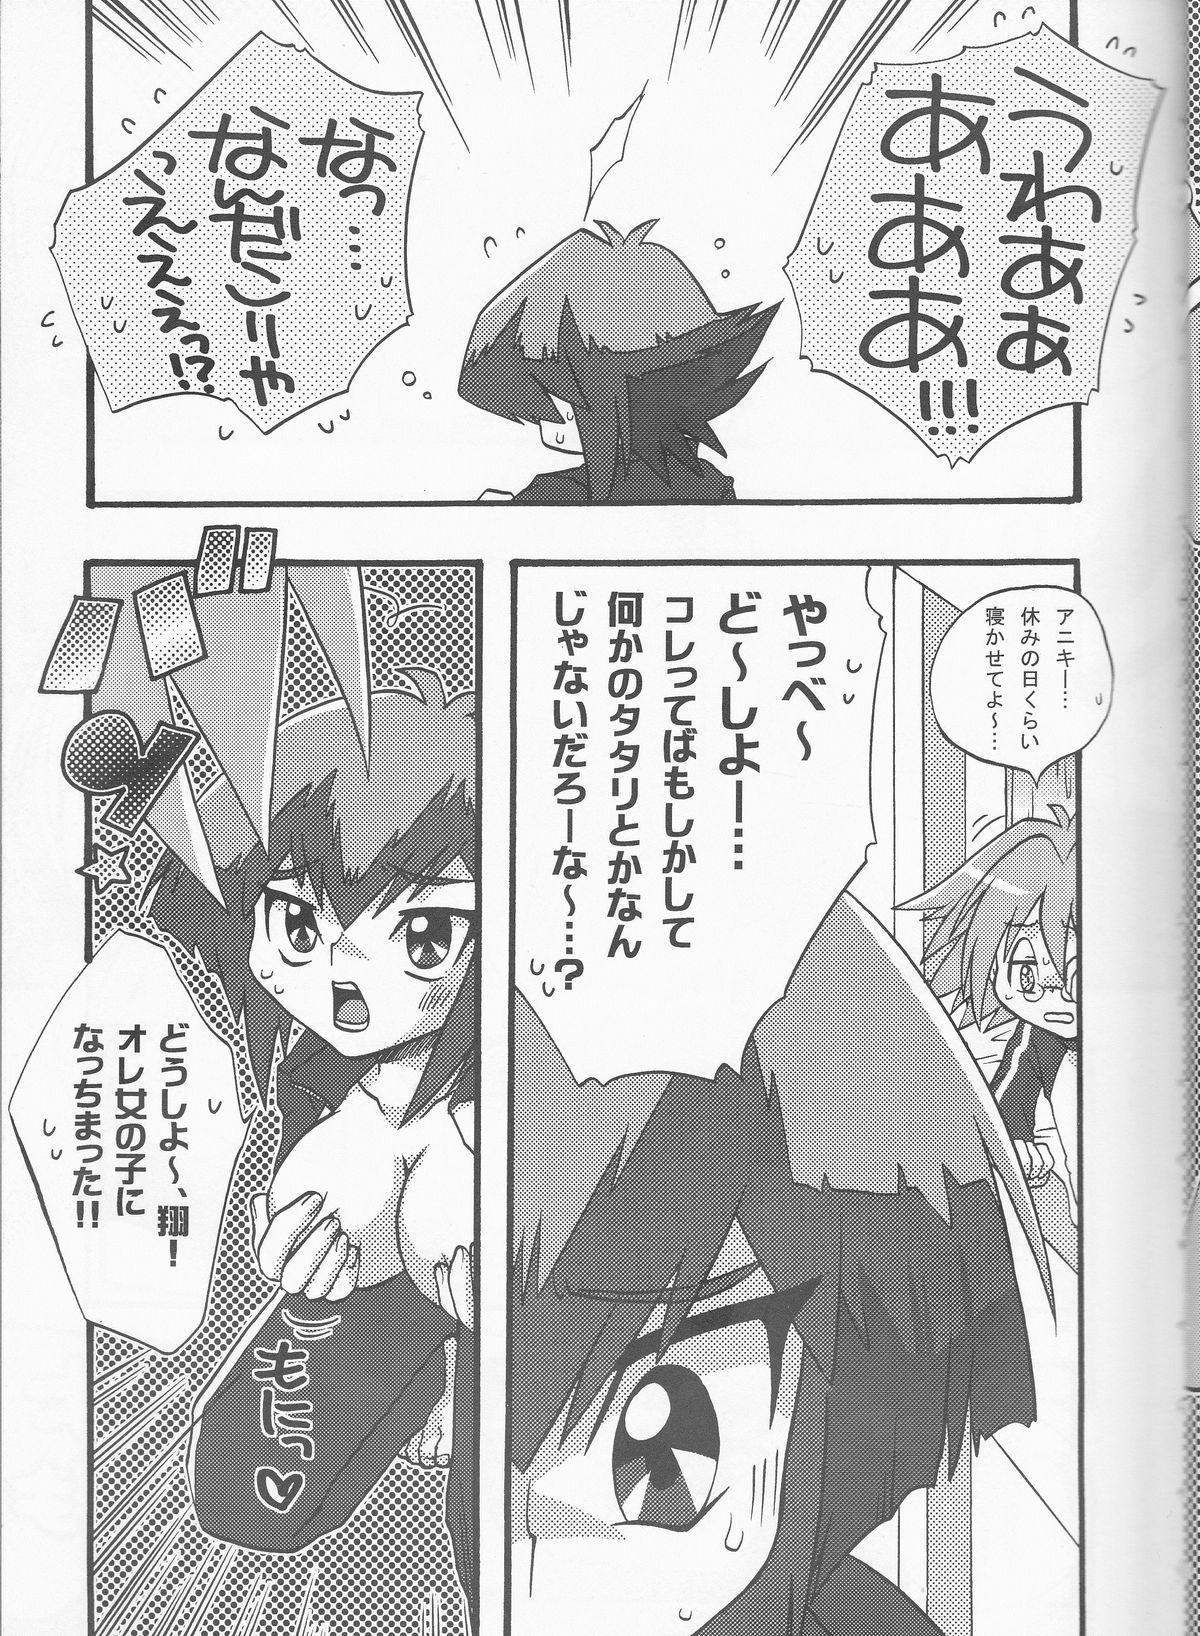 Akuma no Kuchiduke Devil's Kiss 4